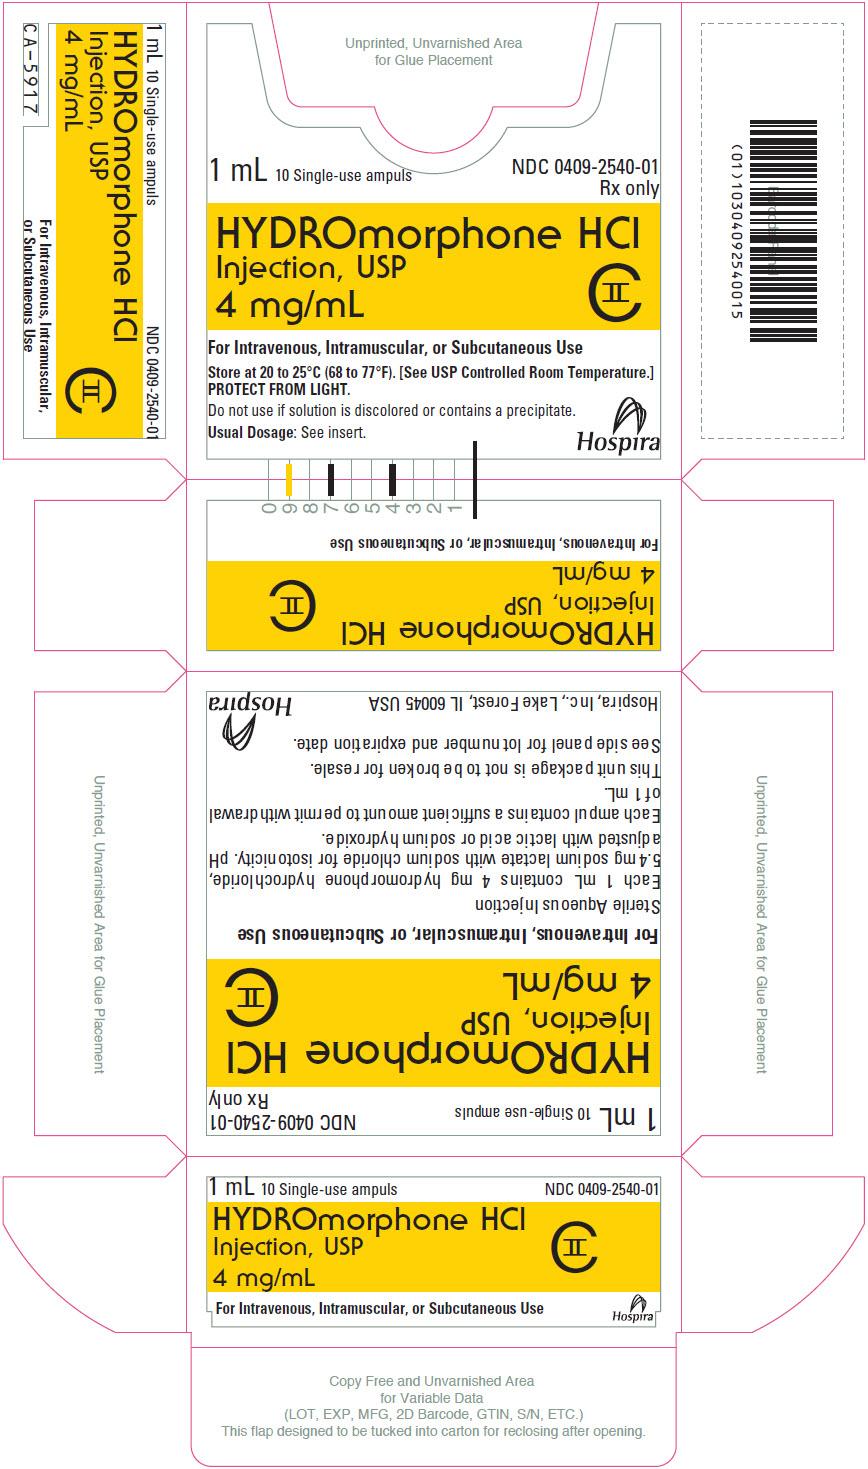 PRINCIPAL DISPLAY PANEL - 4 mg/mL Ampule Box